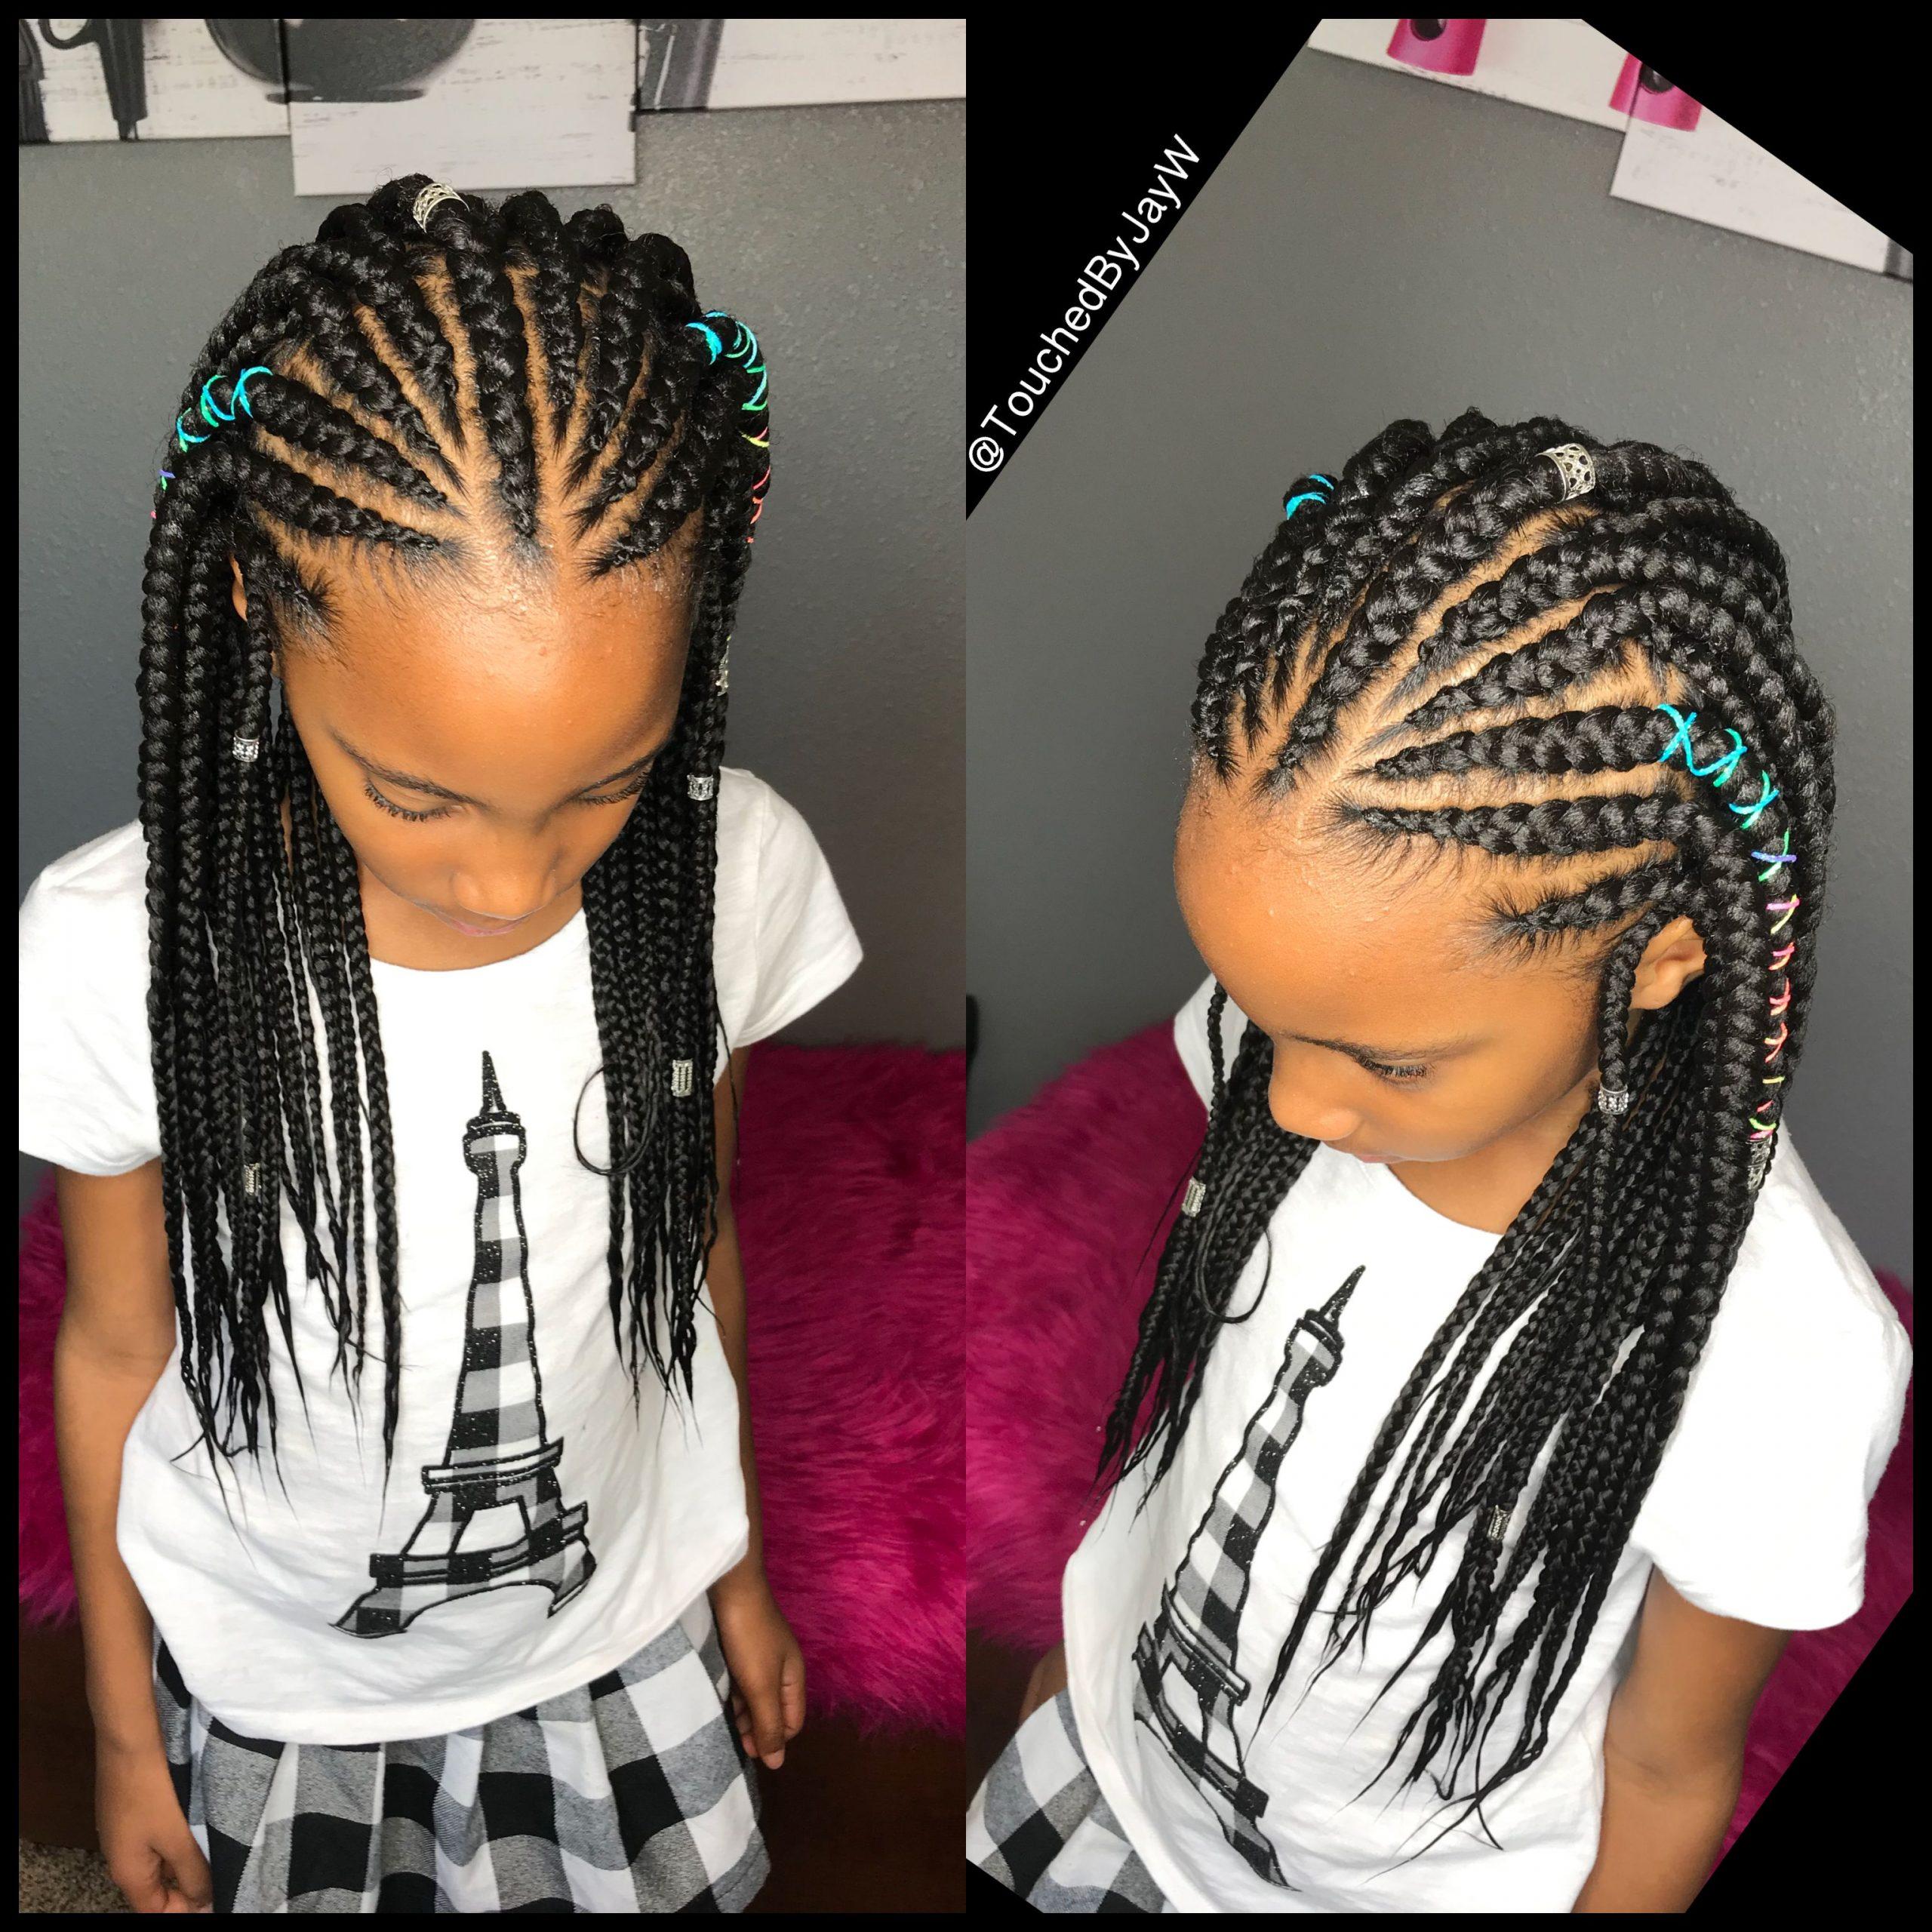 Childish Hairstyle For Trendy Black Girls - Braids ...